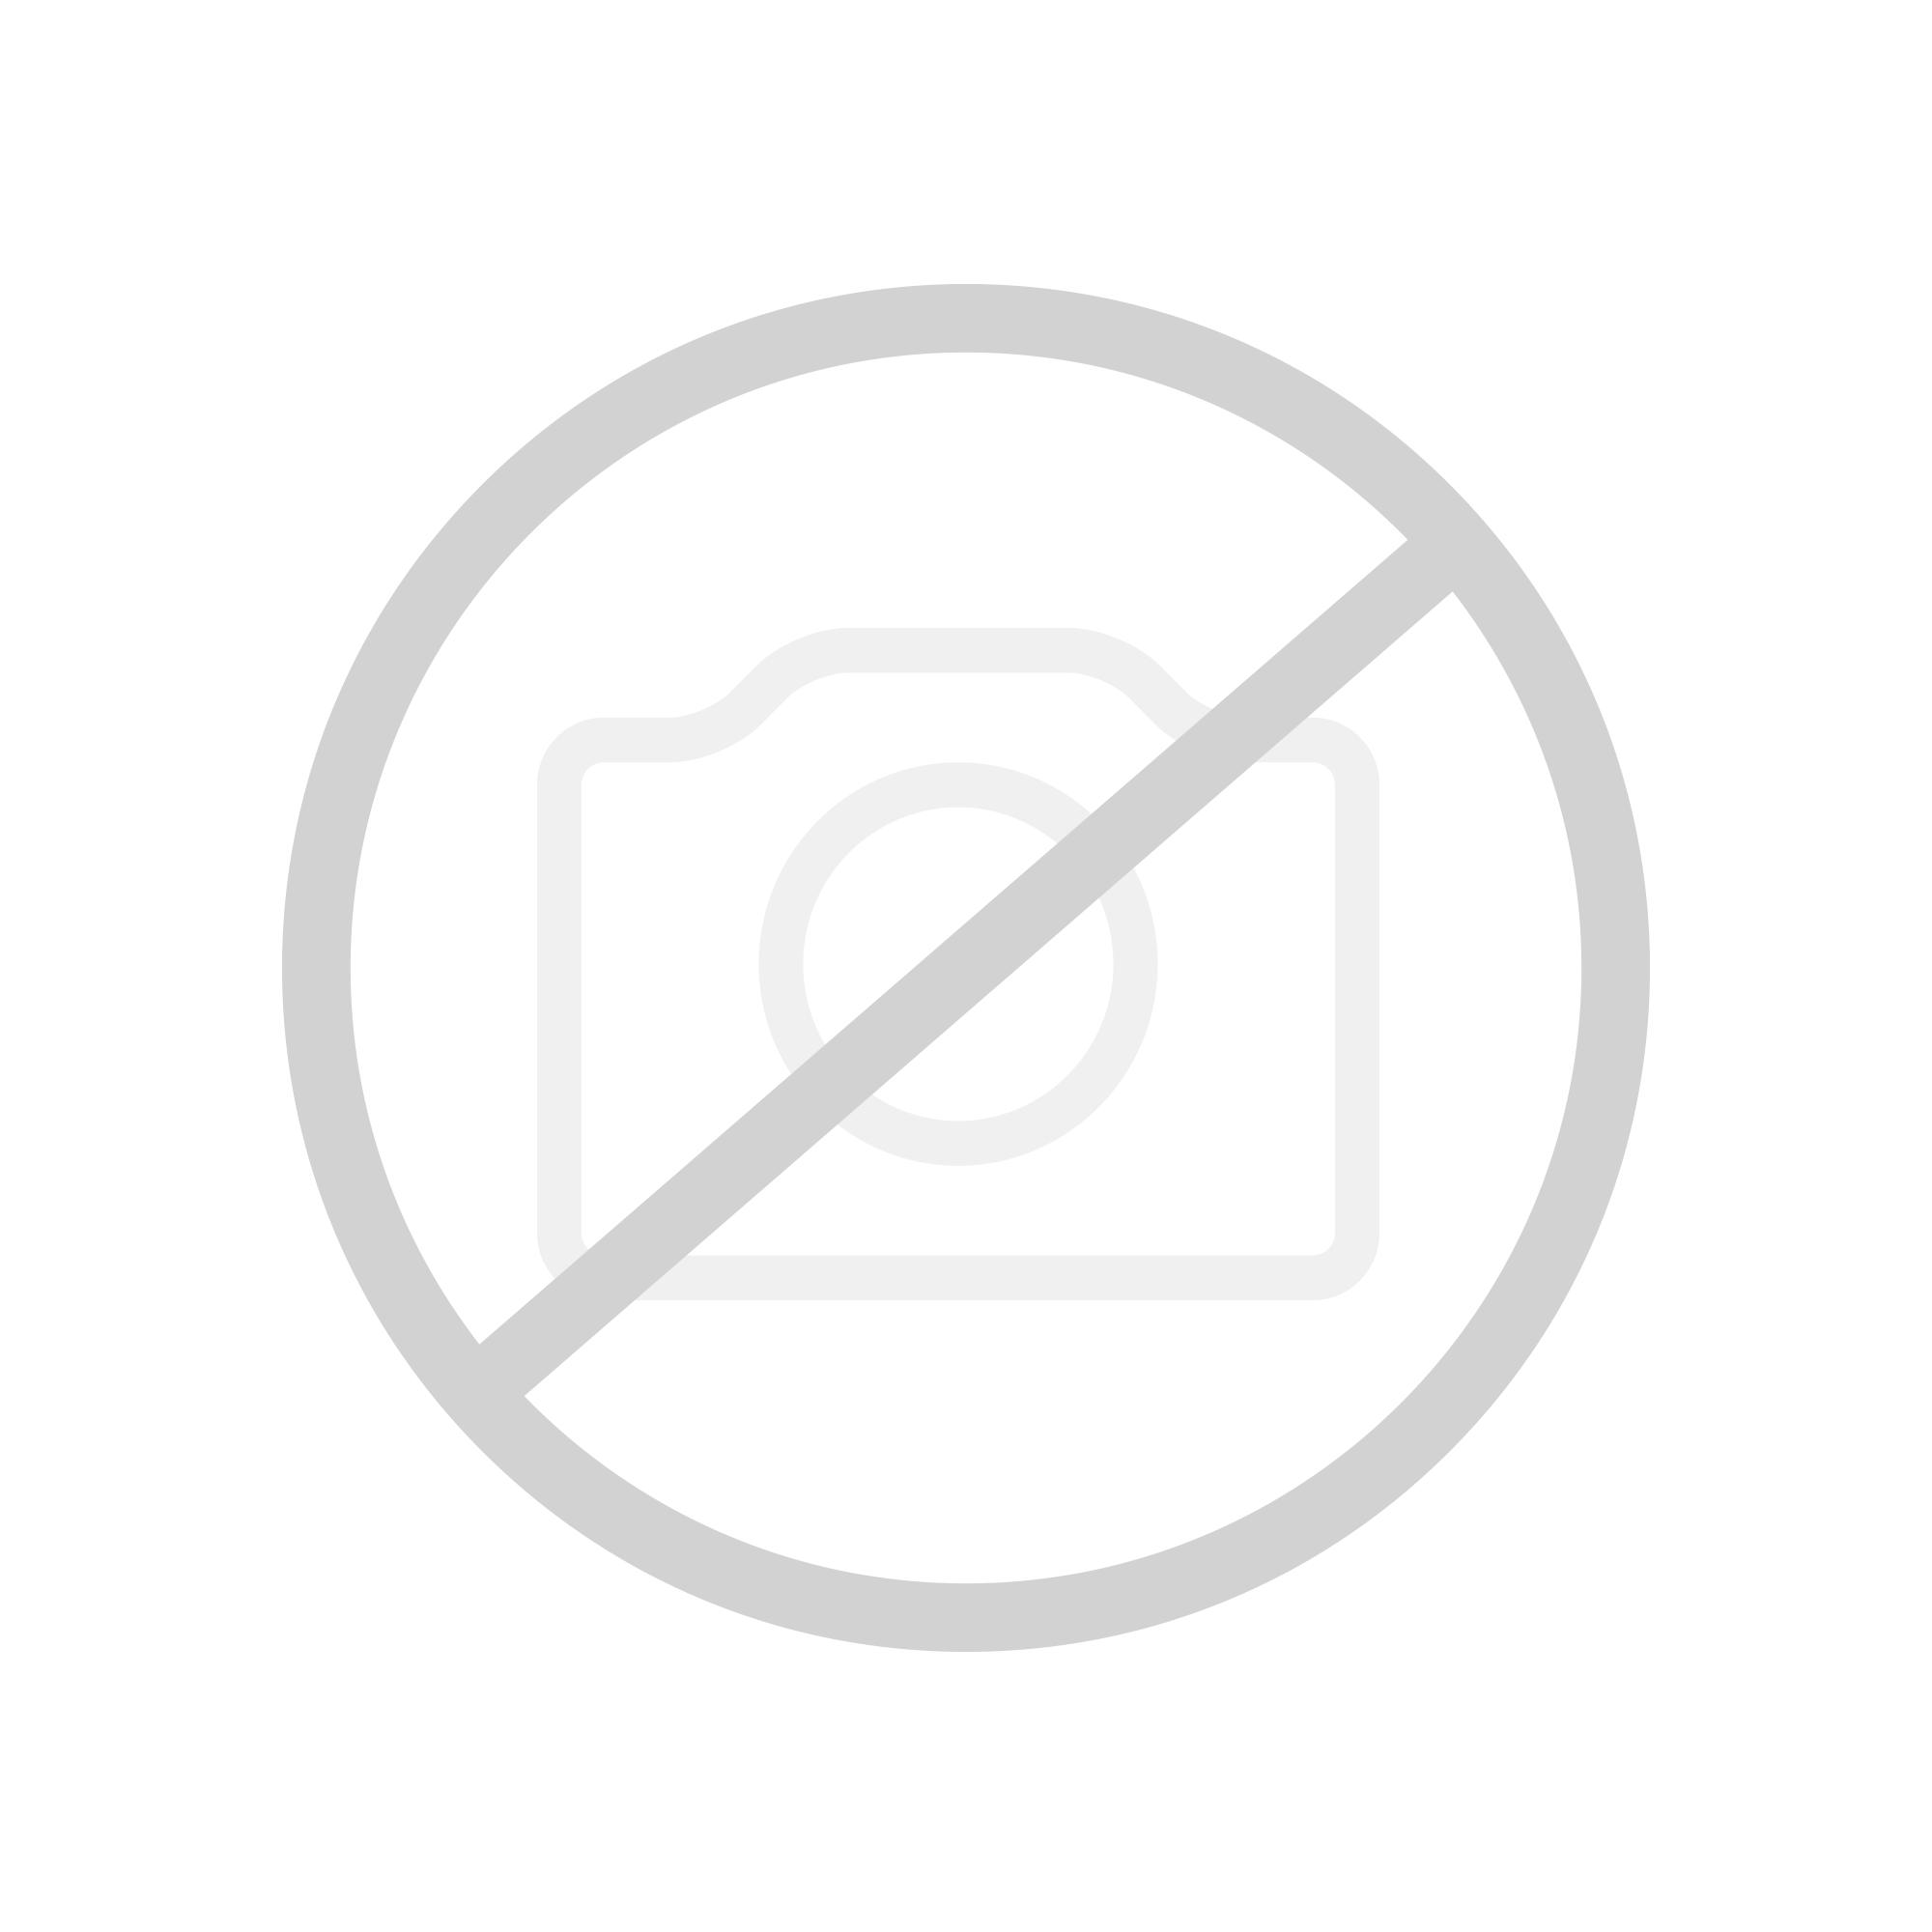 Keuco Moll Abfallsammler, wandhängend chrom/anthrazit